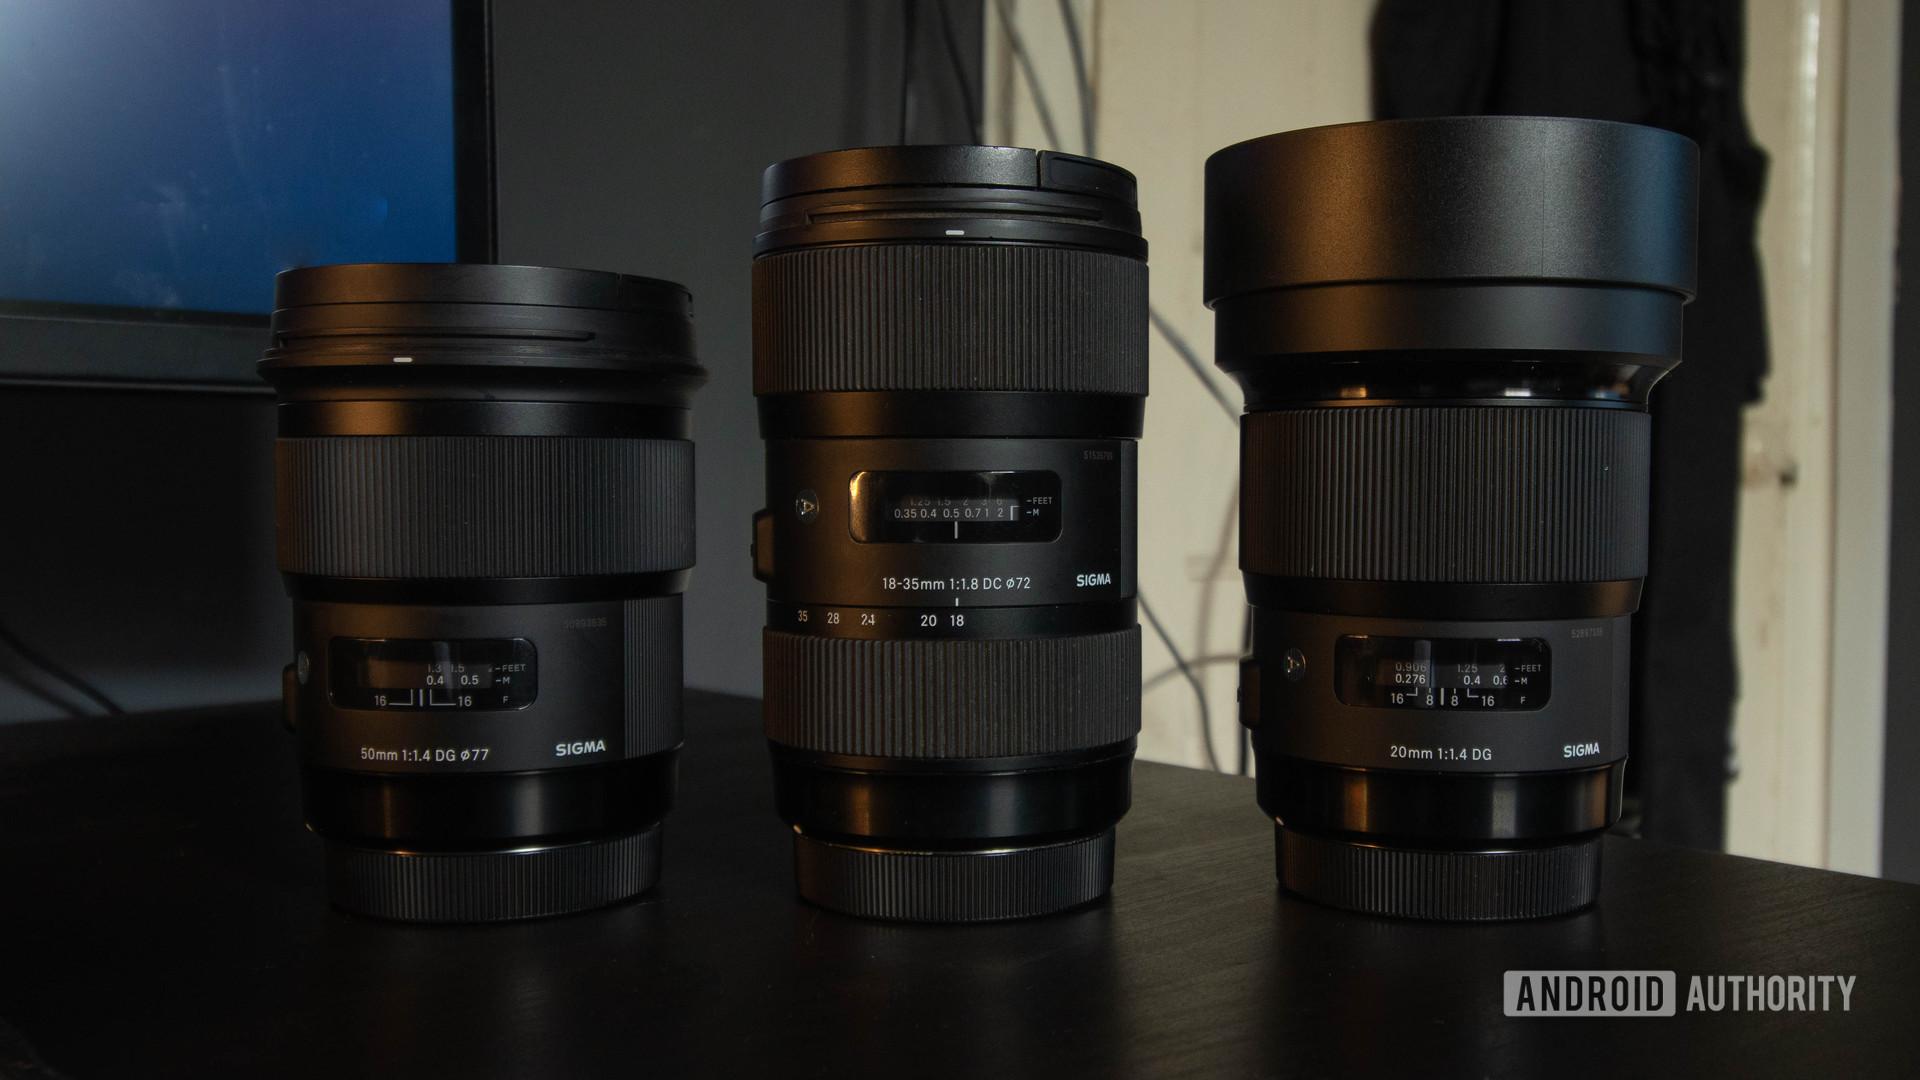 Sigma ART lens product shot